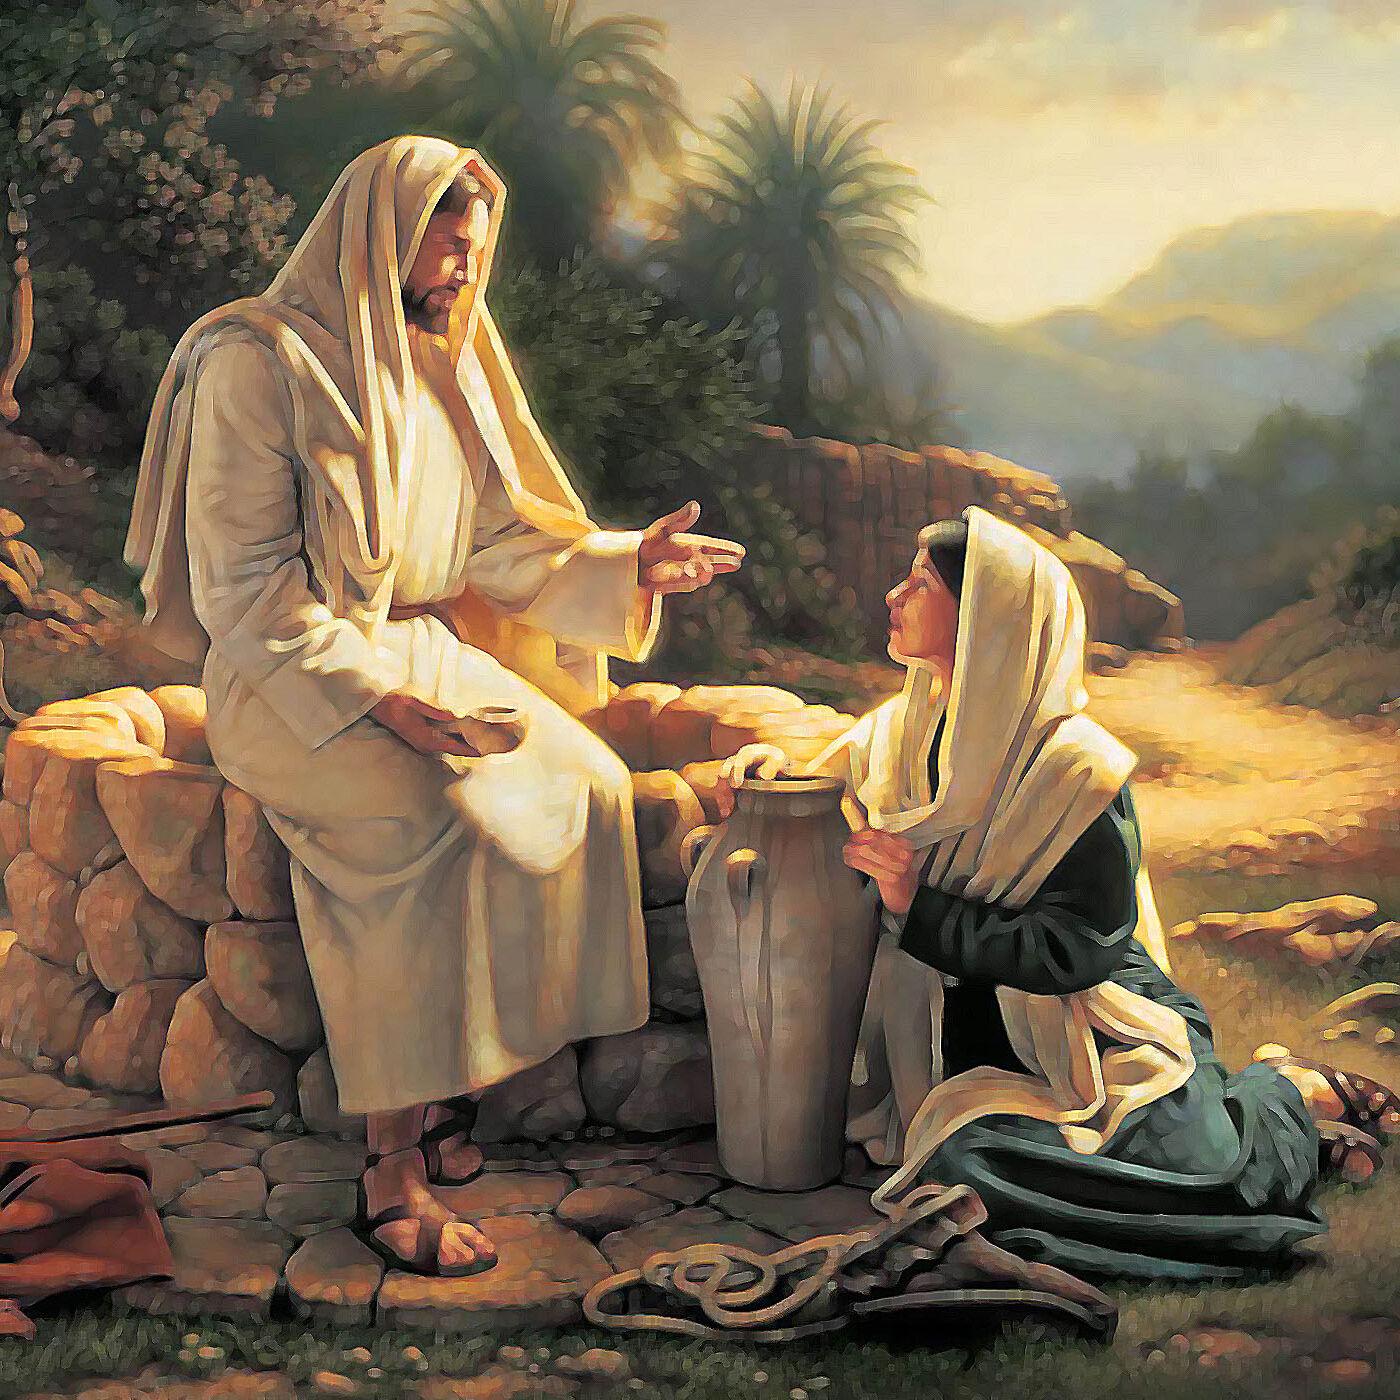 riflessioni sul Vangelo di Venerdì 30 Ottobre 2020 (Lc 14, 1-6) - Apostola Francesca